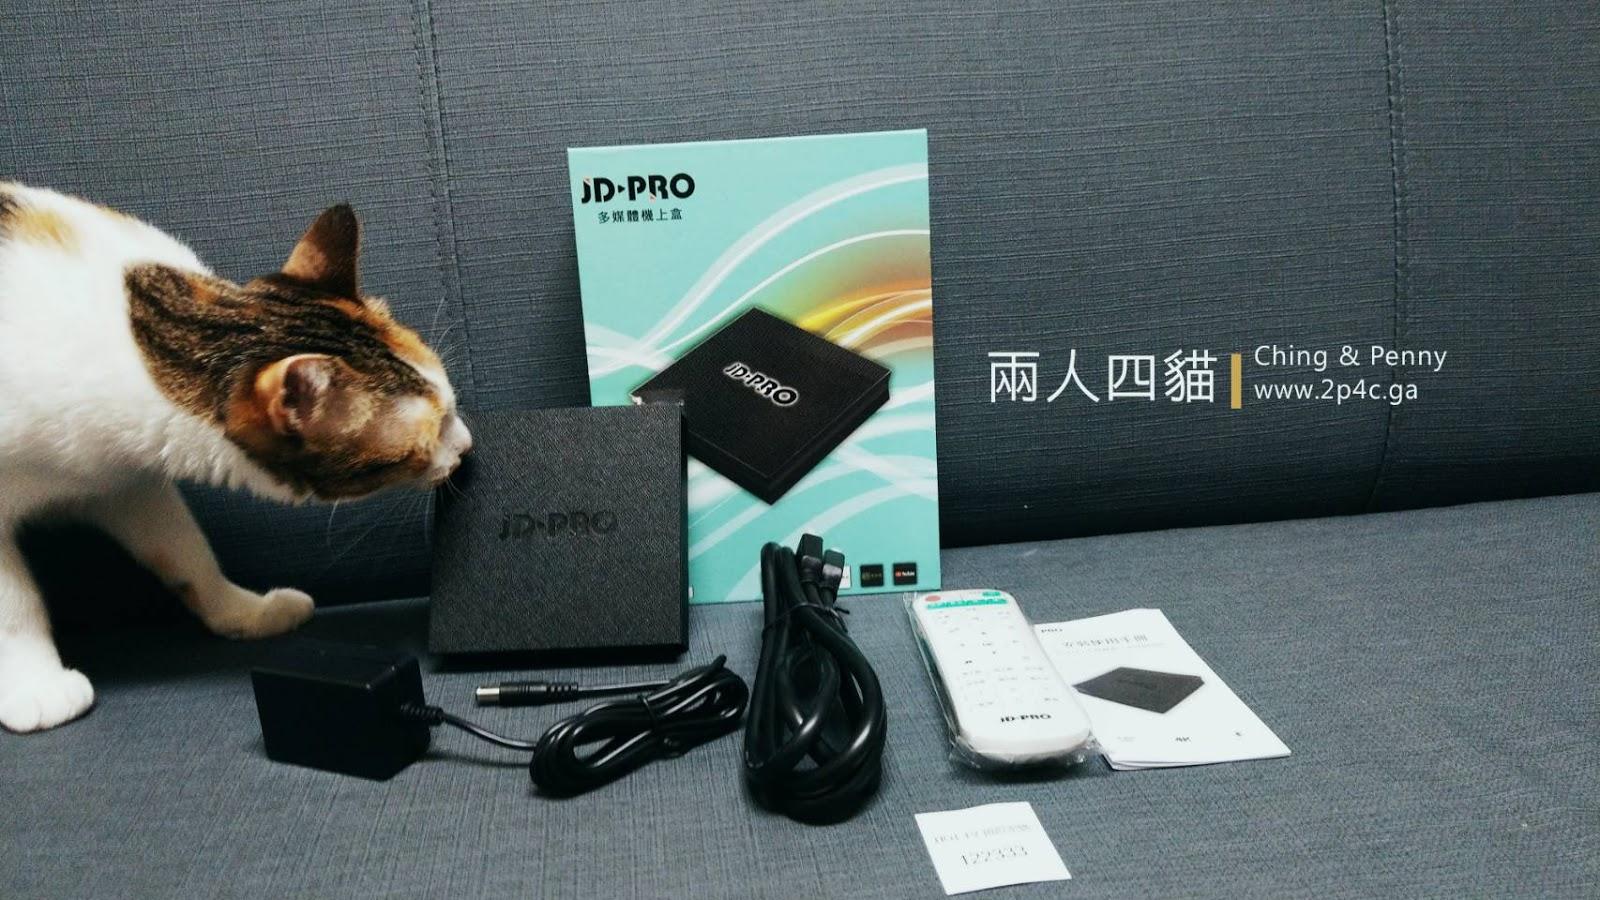 【3C|機上盒】家庭一定要有的追劇神器!JD-PRO雲寶盒 數位機上盒開箱